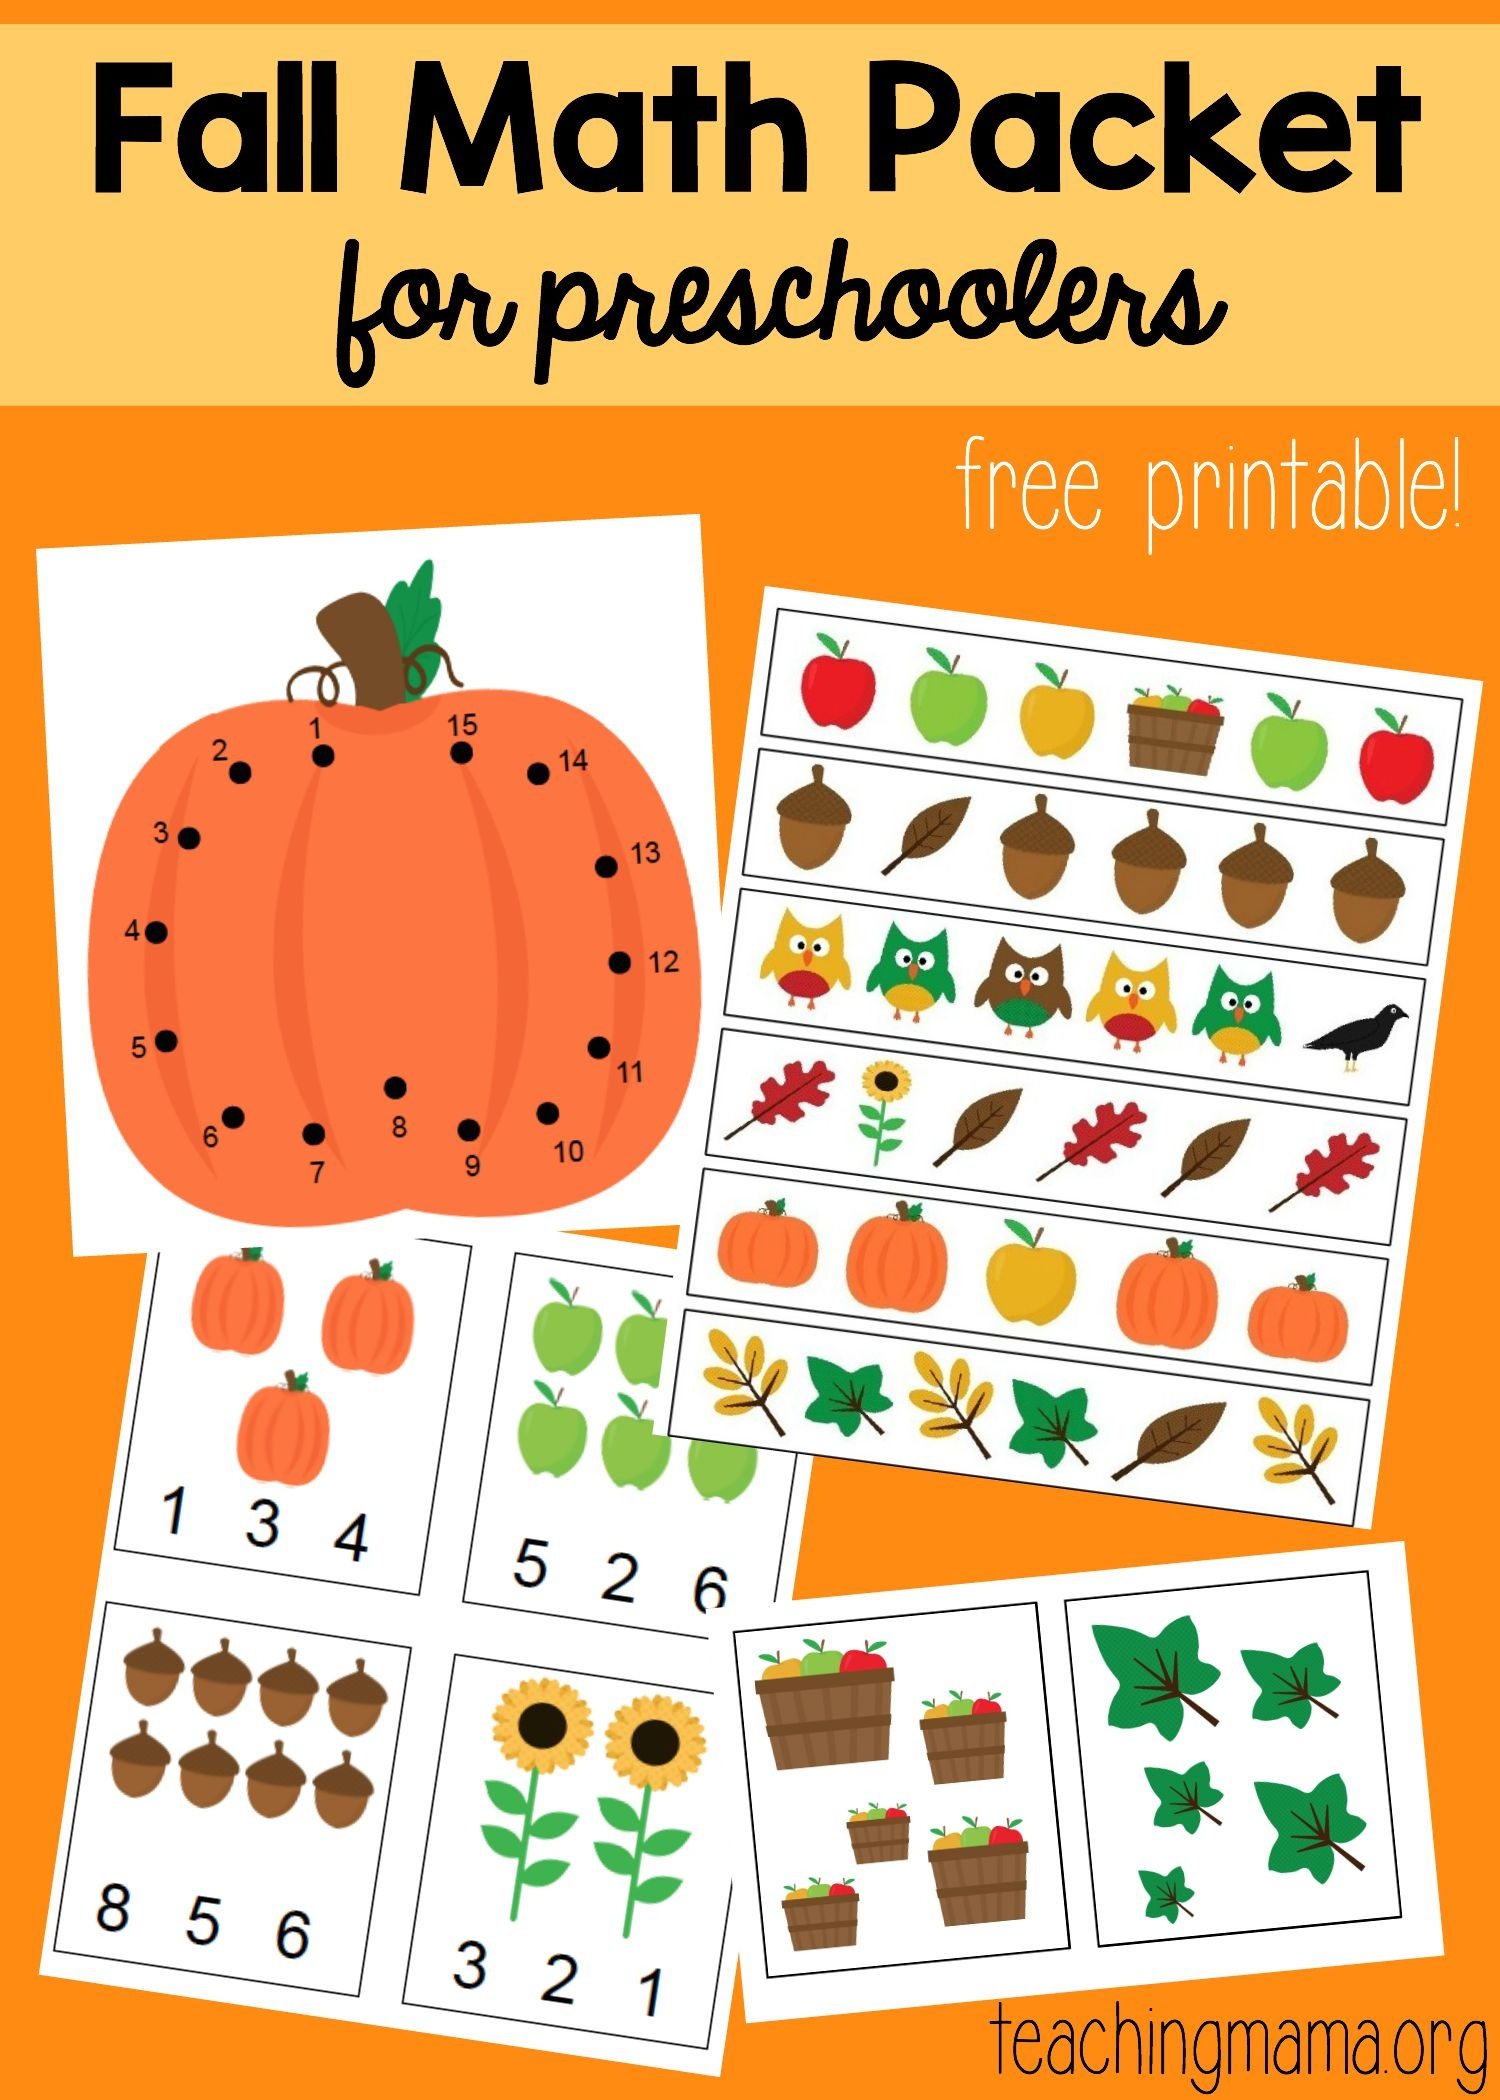 Fall Math Packet For Preschoolers - Free October Preschool Printables